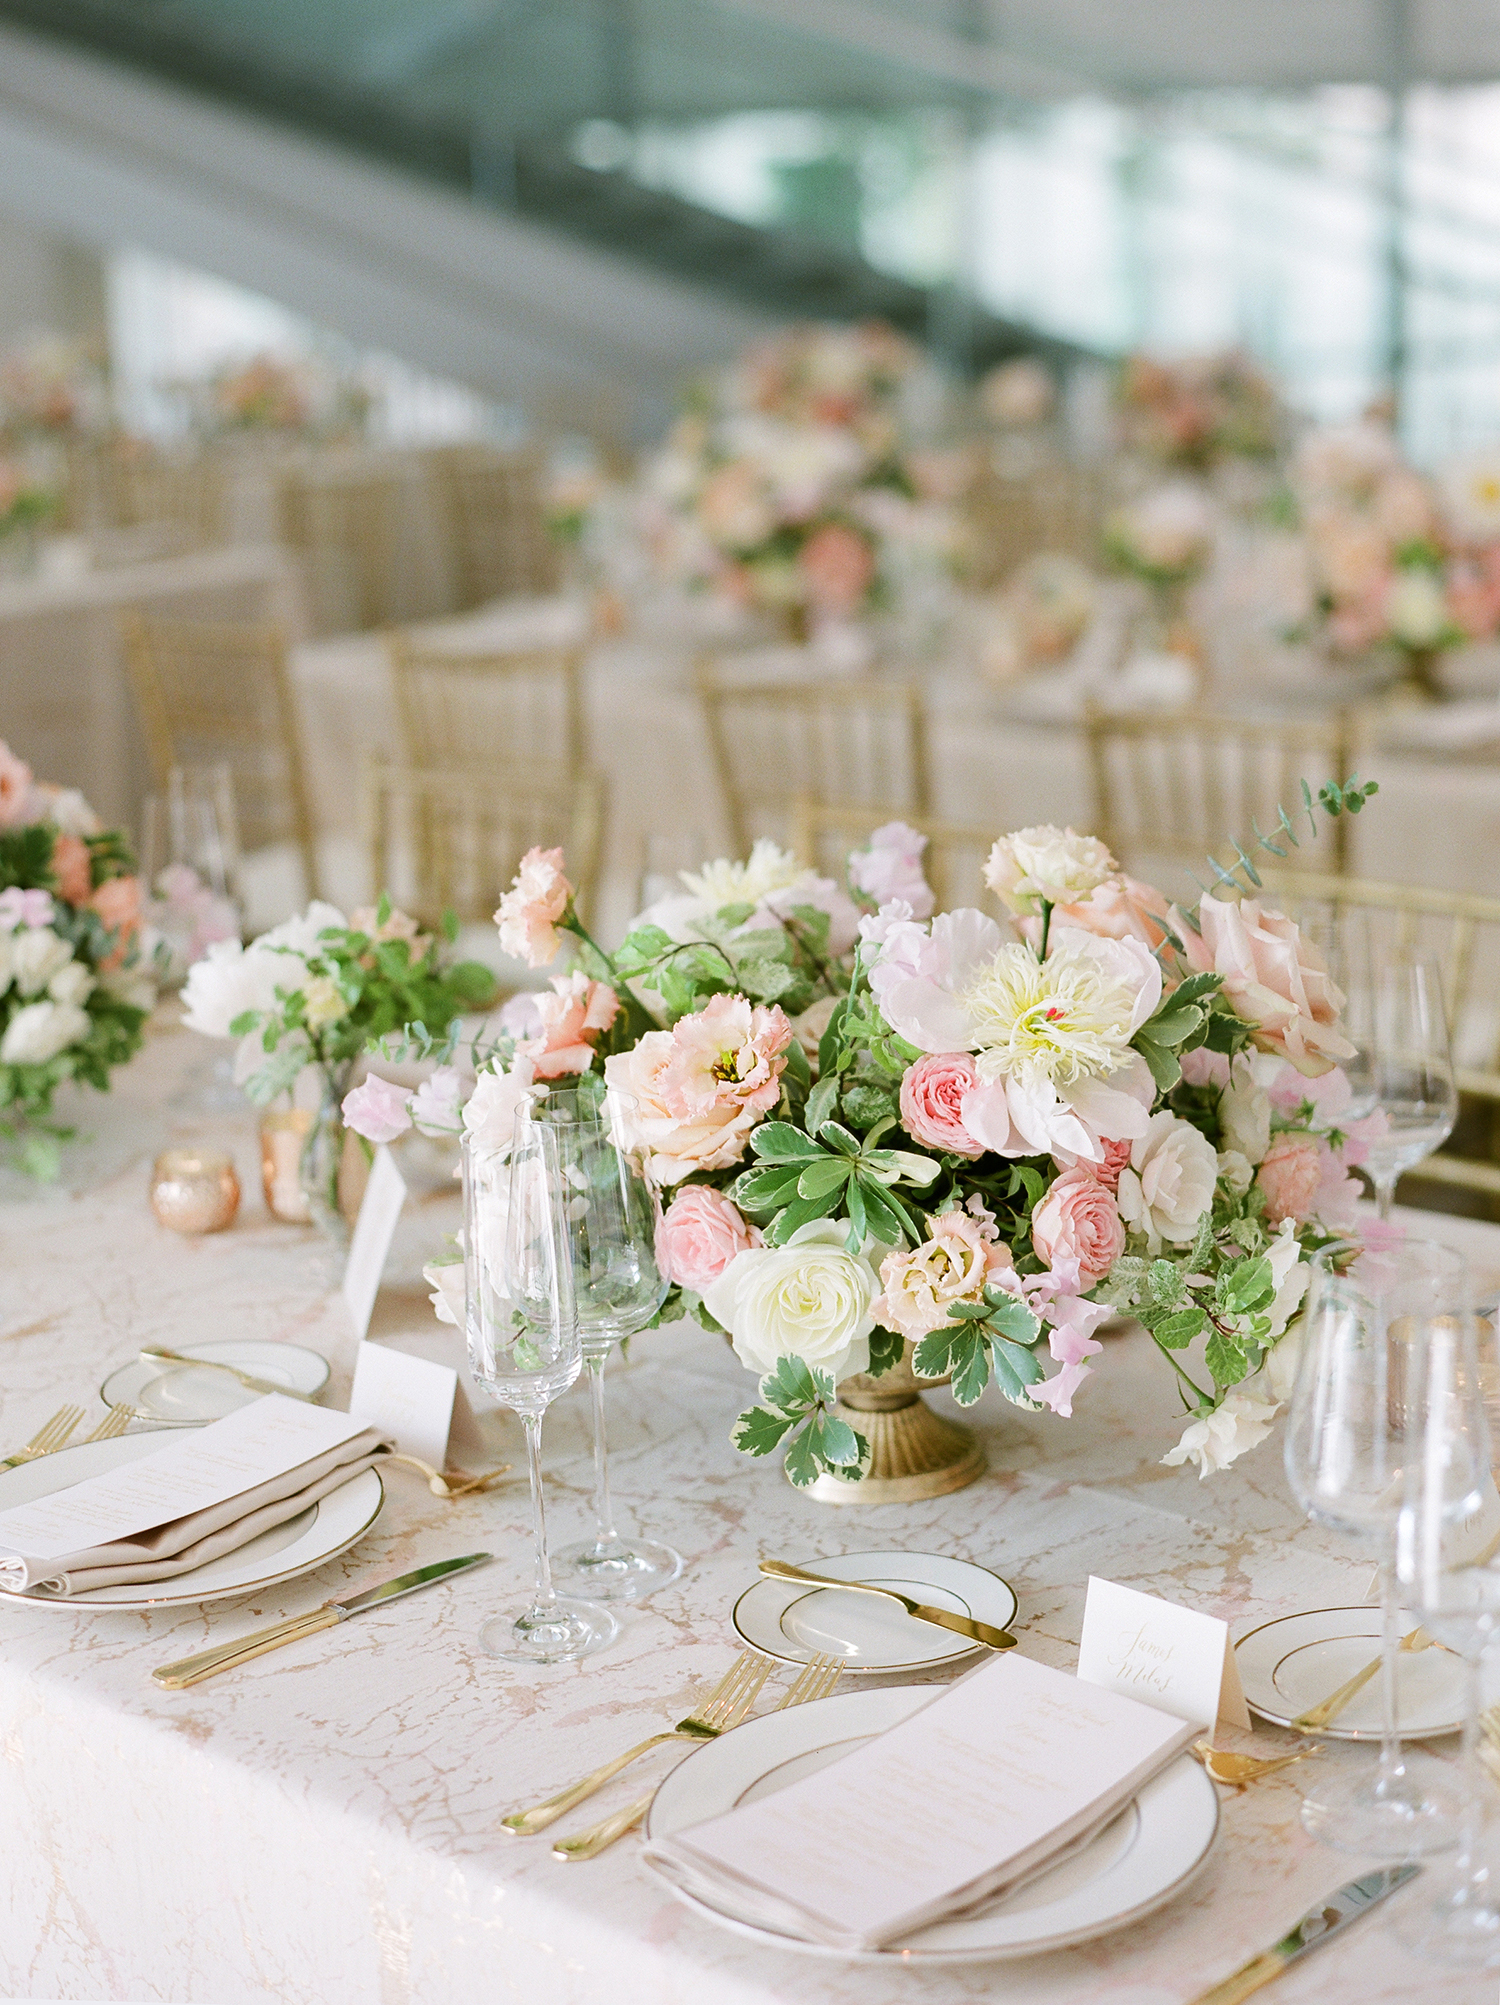 anwuli patrick wedding pastel centerpieces on table